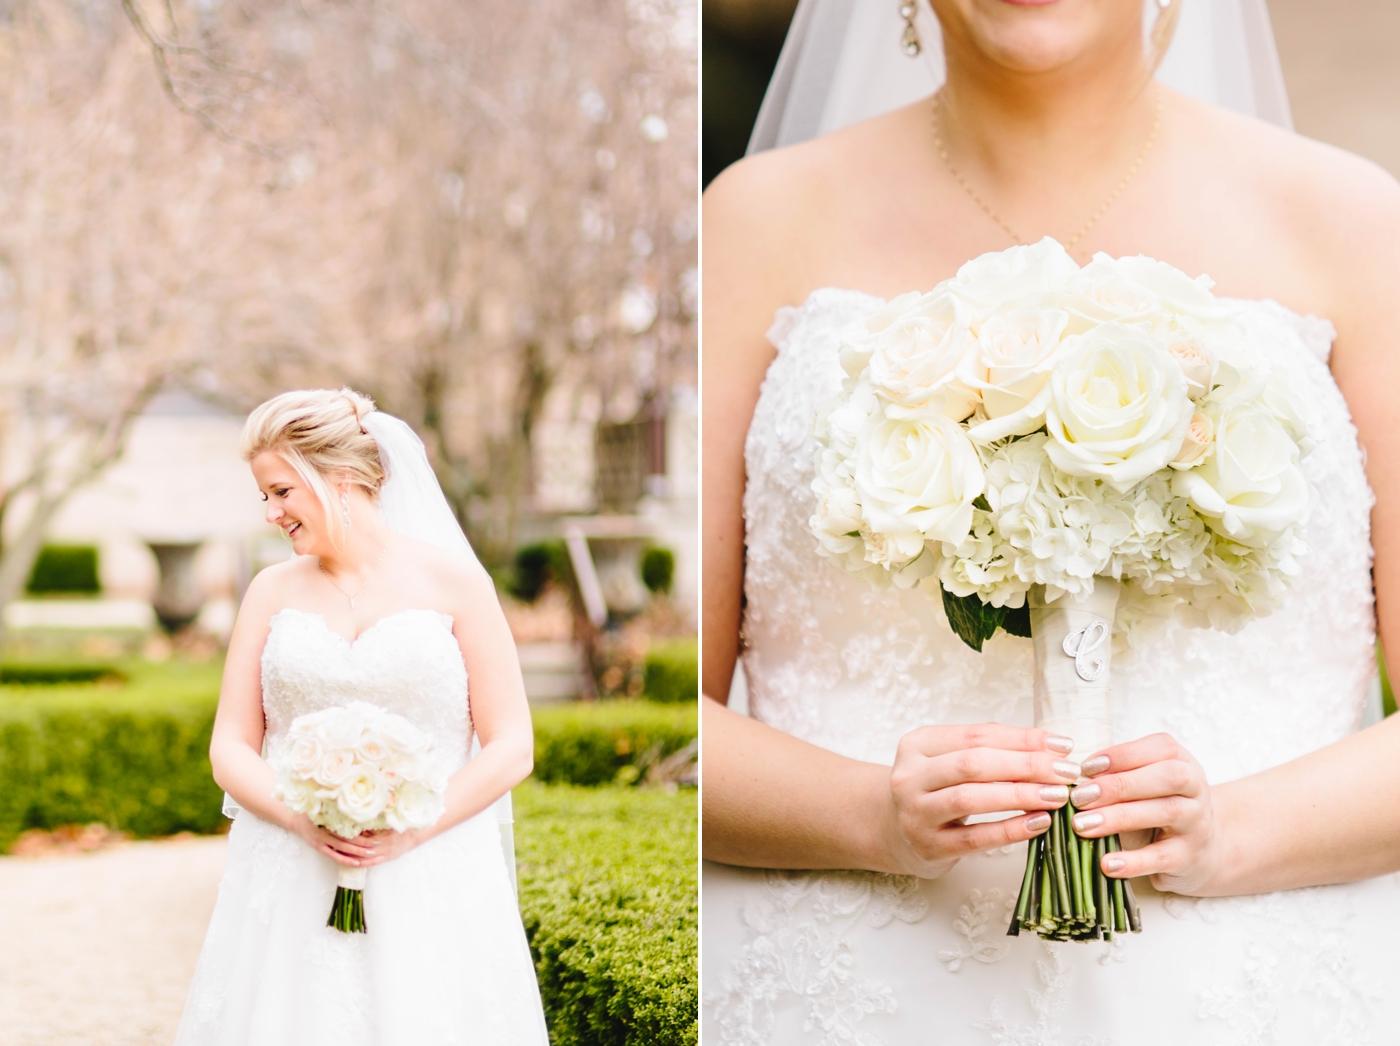 chicago-fine-art-wedding-photography-cassady17